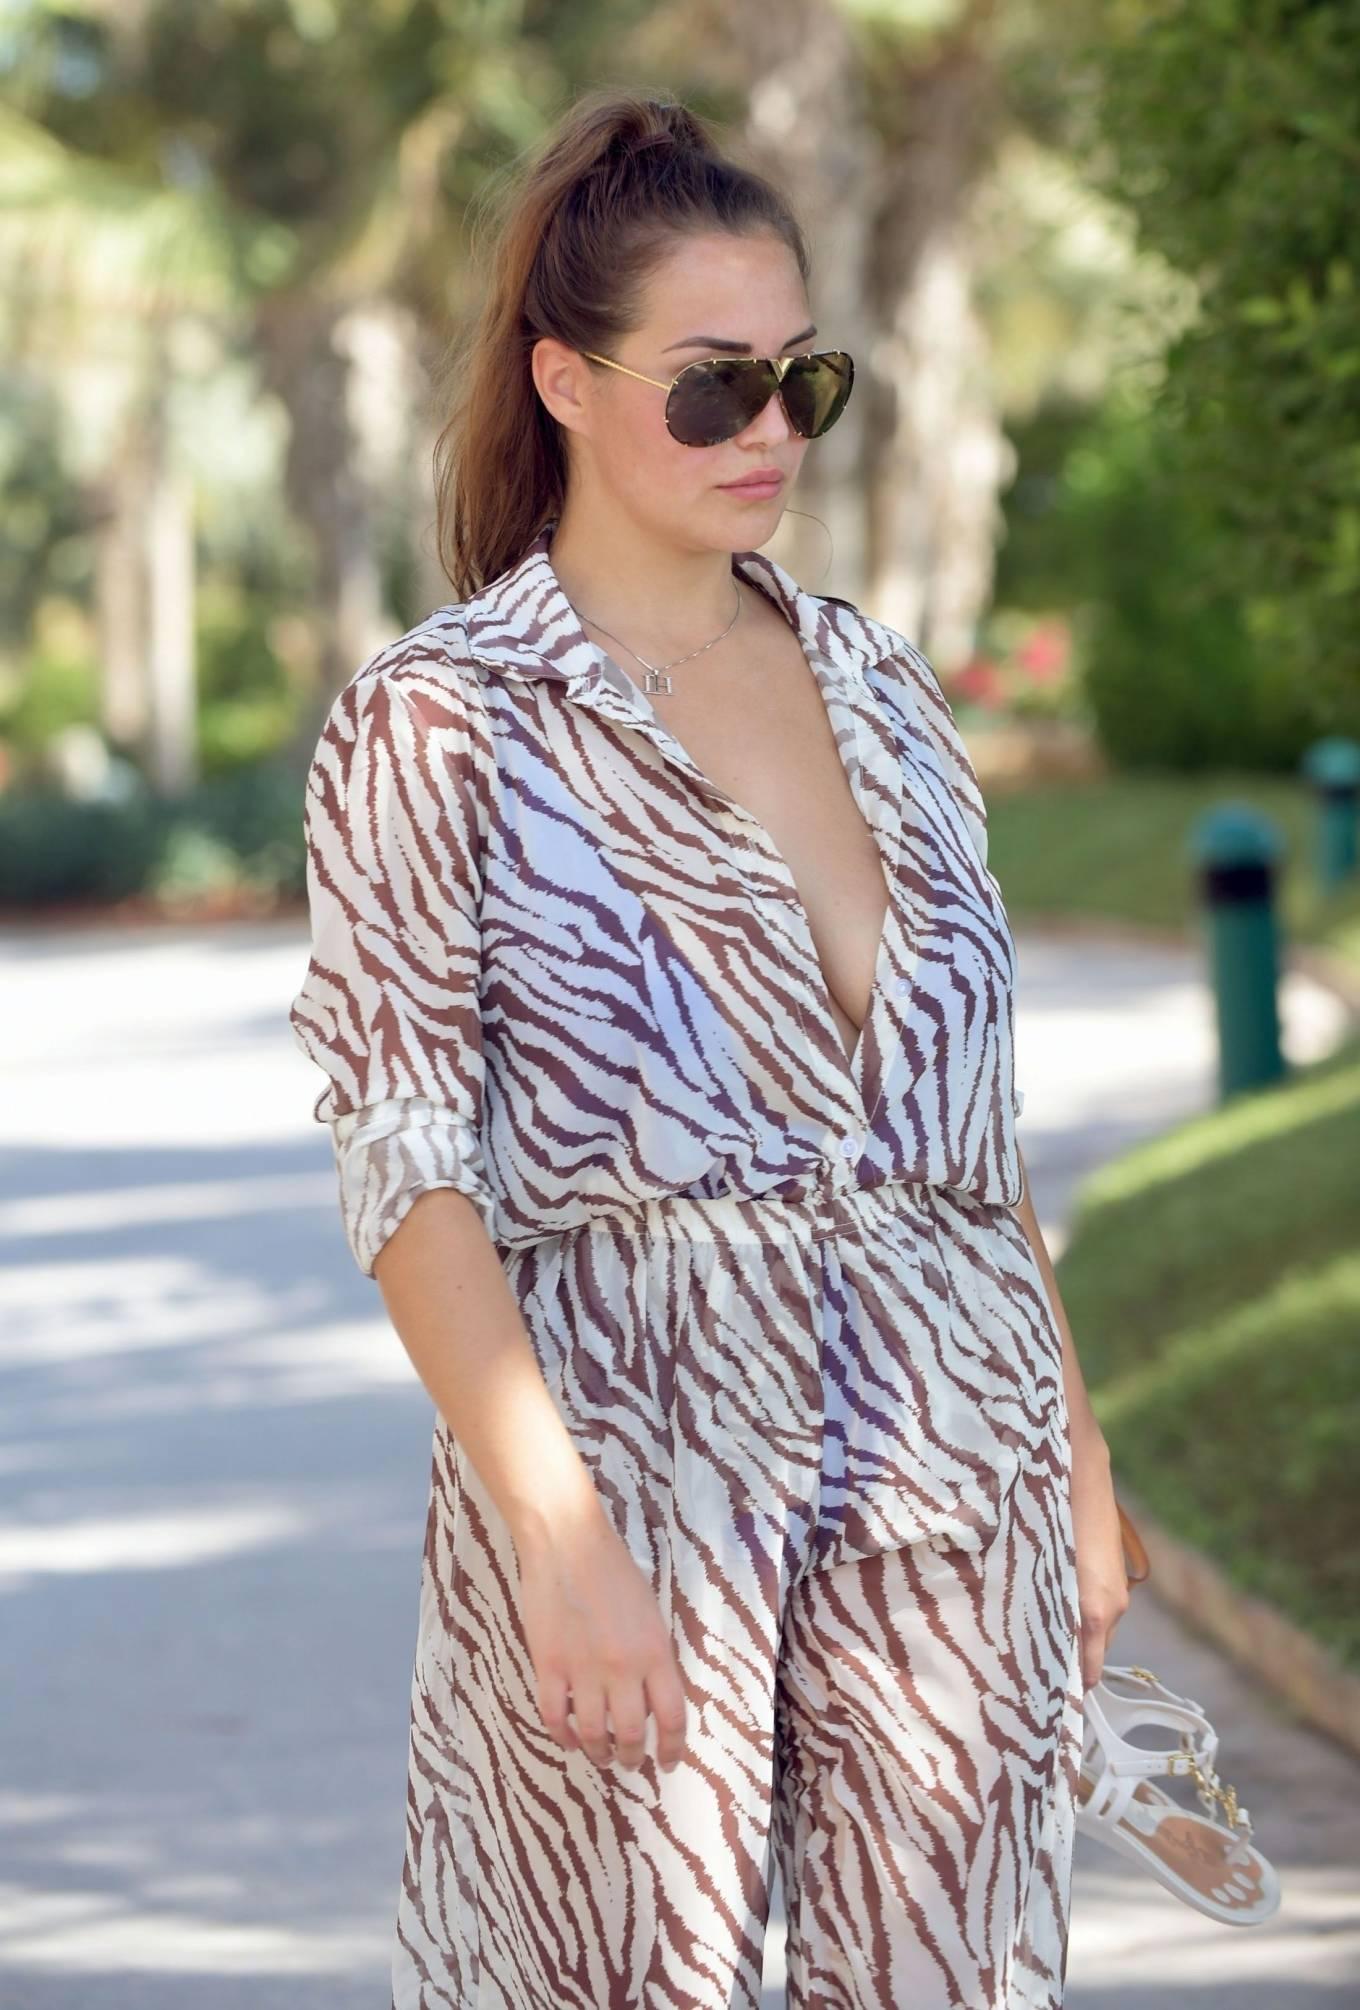 Chloe Goodman 2020 : Chloe Goodman – In a zebra print jumpsuit out on holiday in Dubai-11